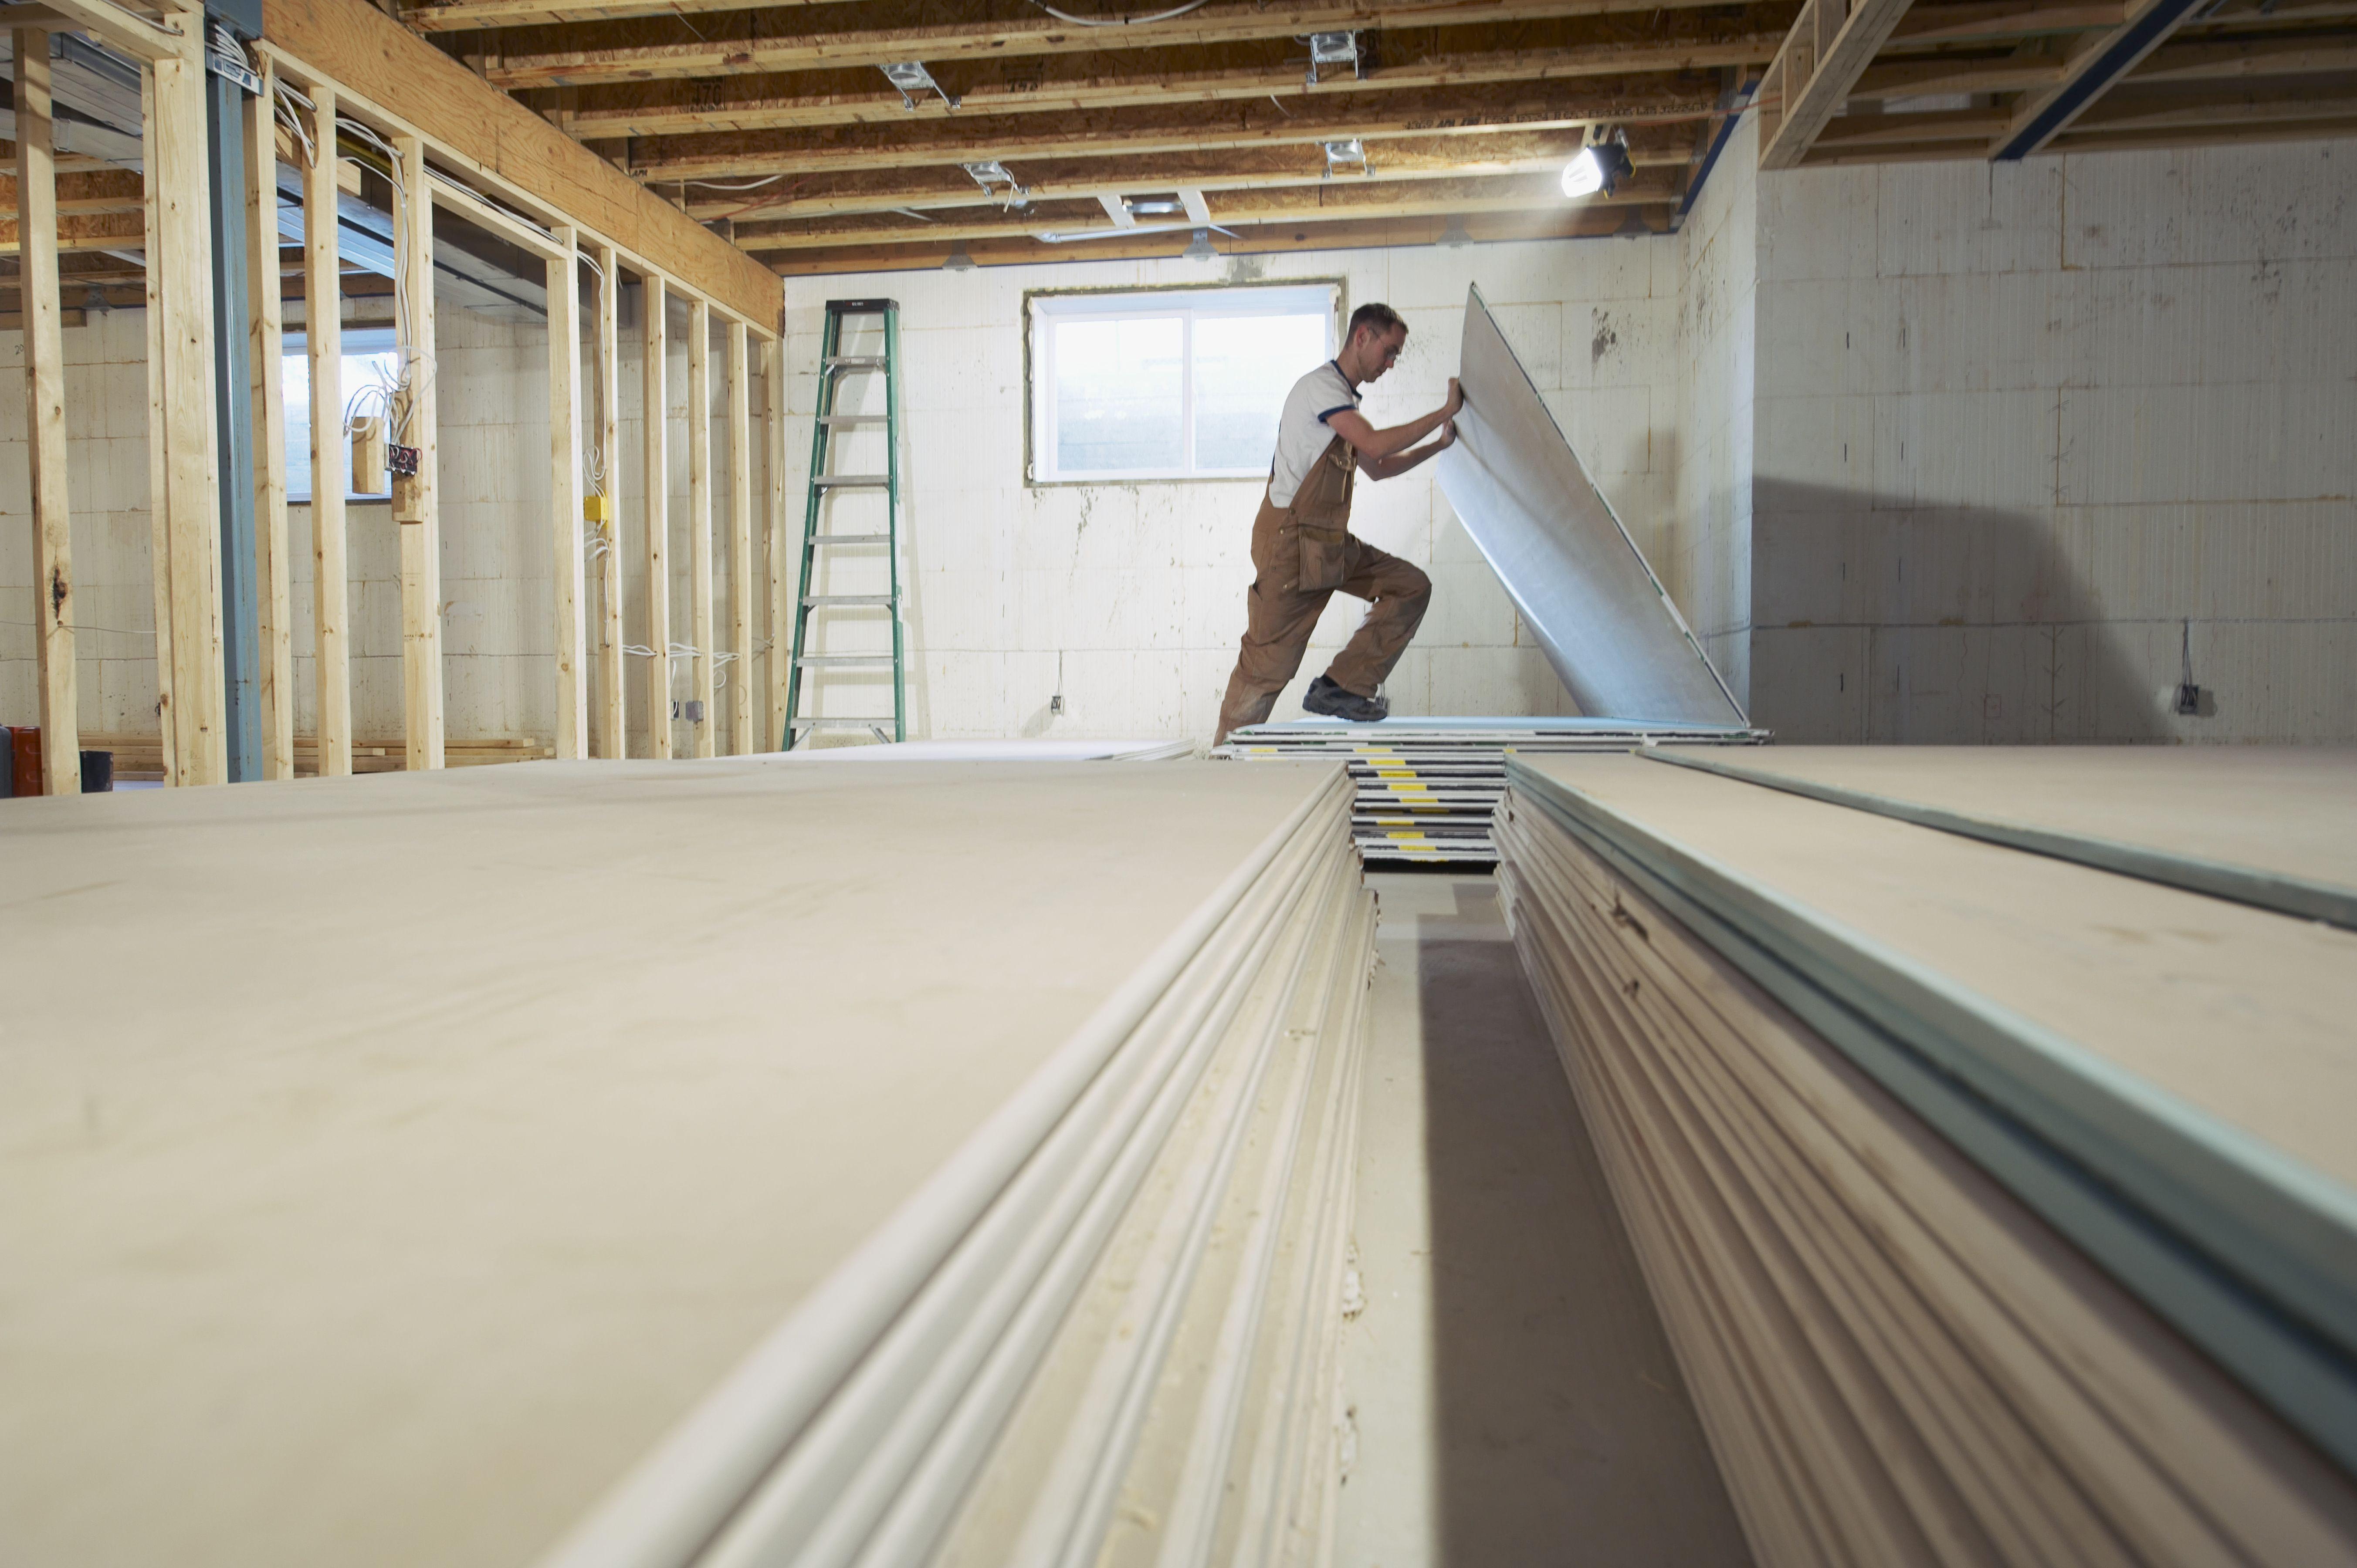 cost of hardwood floors for 2000 sq ft of average basement finishing cost inside man installing drywall in new house 522951112 5b12da6dba6177003d66594d